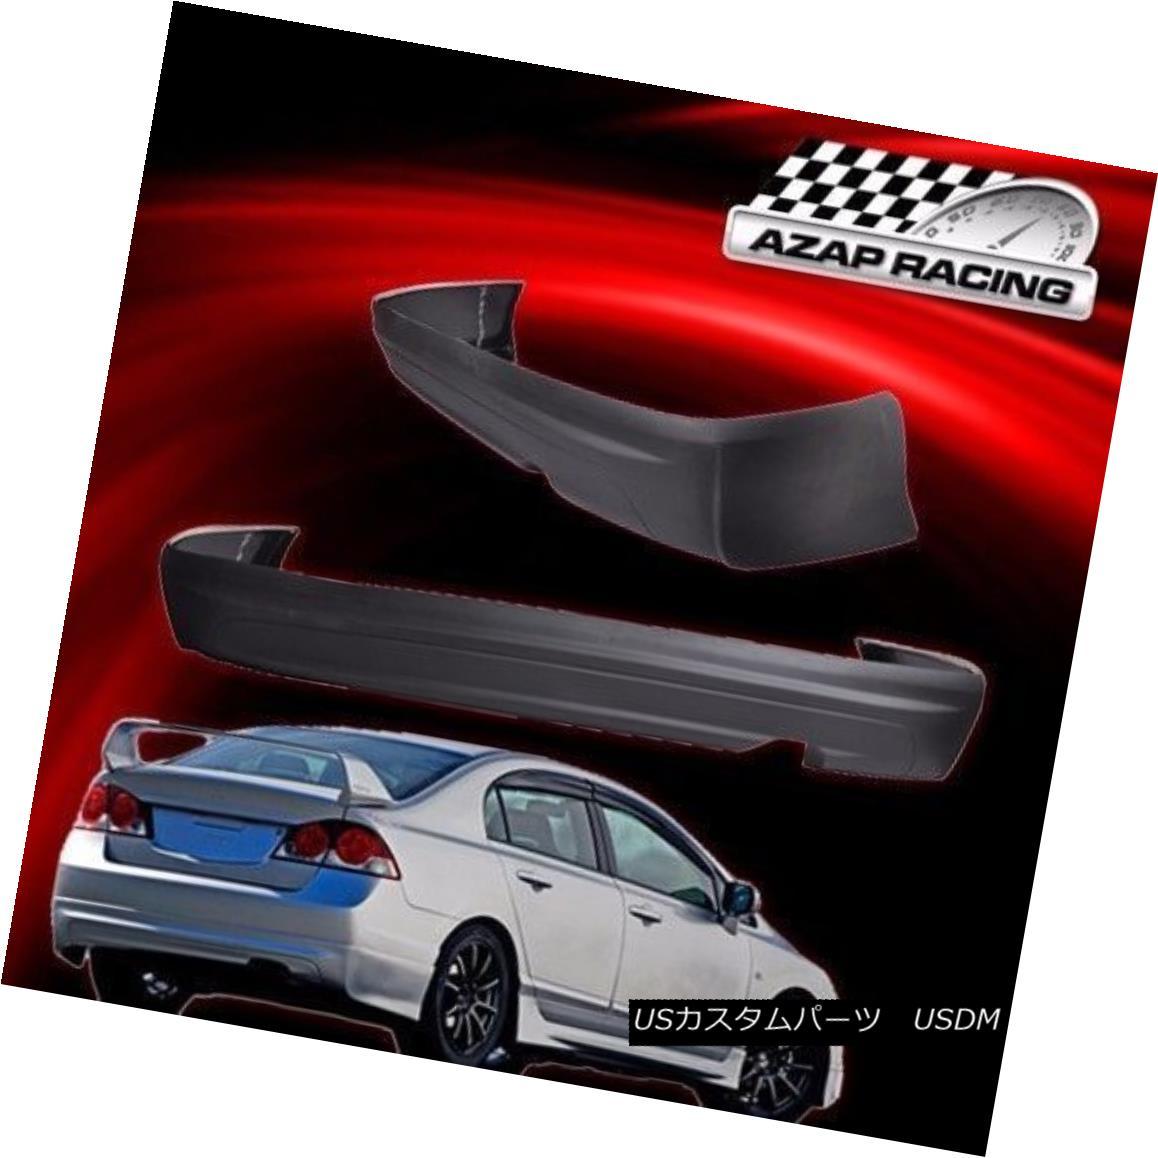 05 Fits Subaru Impreza Outback Max Performance Ceramic Brake Pads R